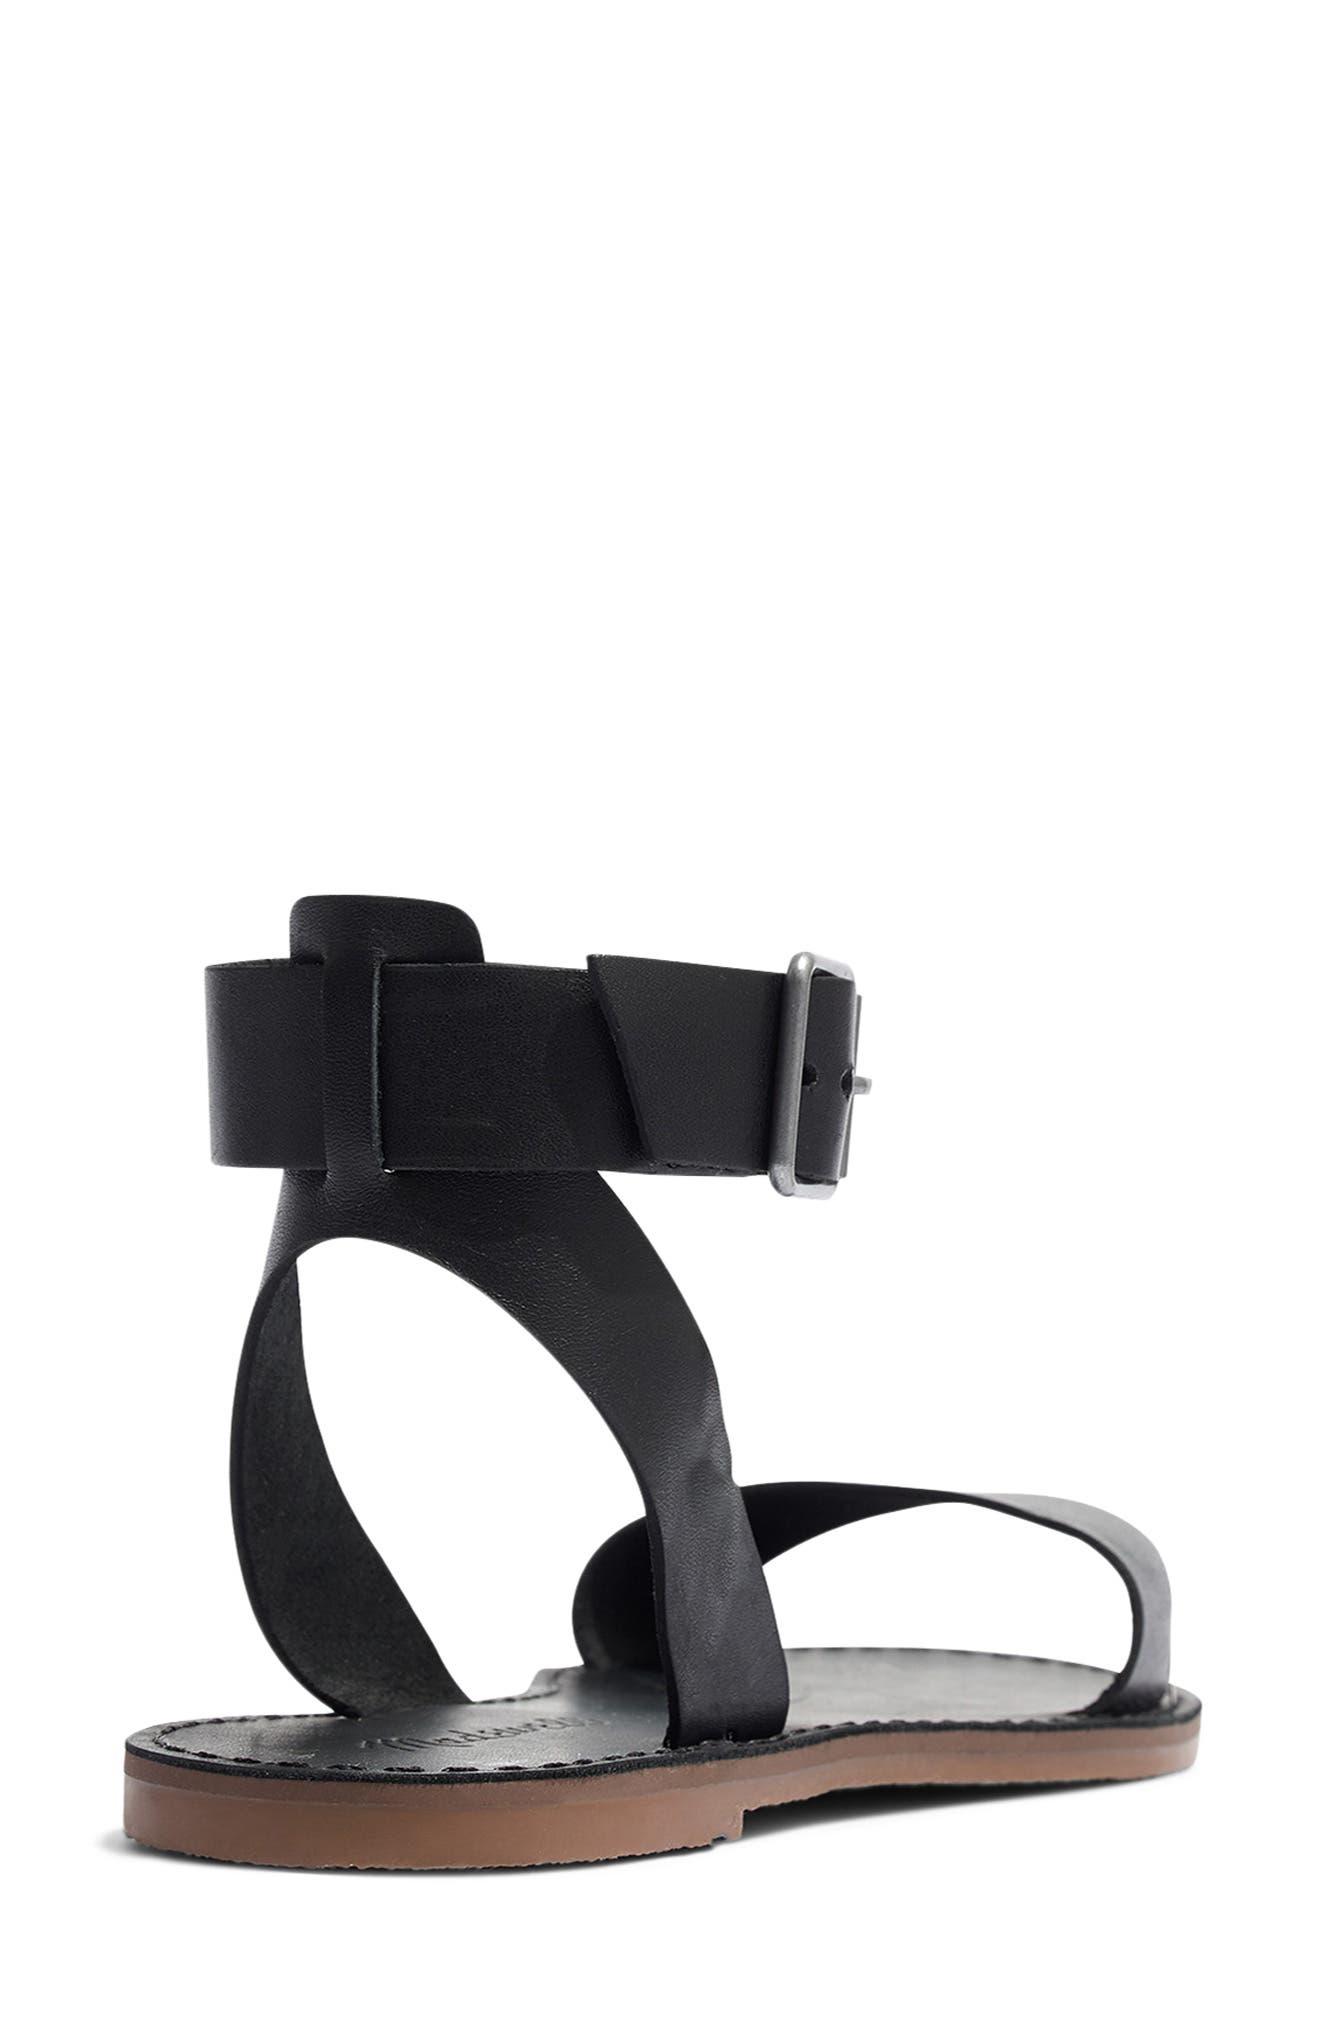 MADEWELL,                             The Boardwalk Ankle Strap Sandal,                             Alternate thumbnail 2, color,                             TRUE BLACK LEATHER